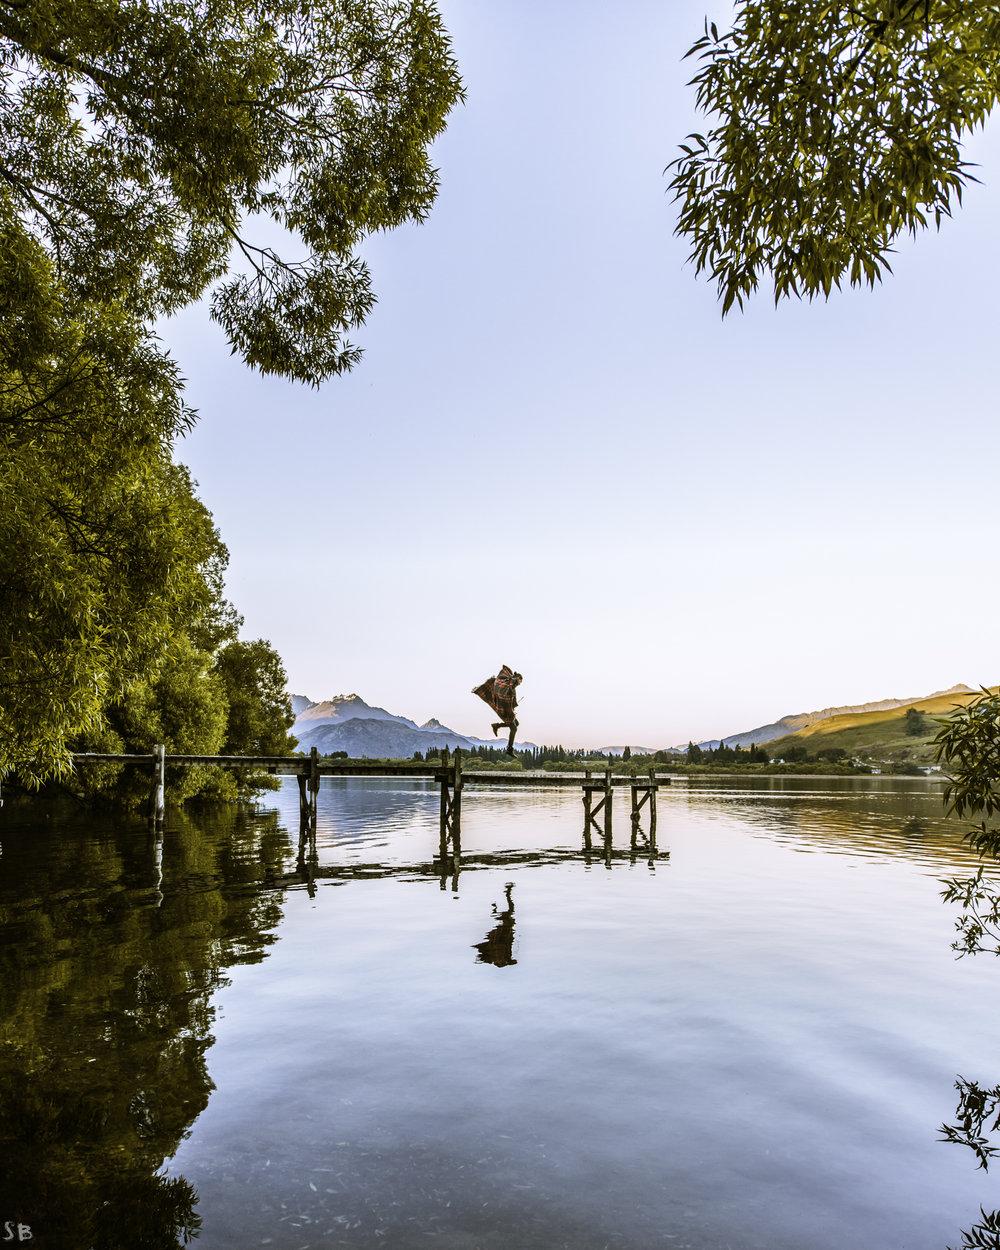 Samuel Bingham, Lake Hayes, Central Otago, Nikon D800, 200mm, 1/200s, f/4, ISO 200